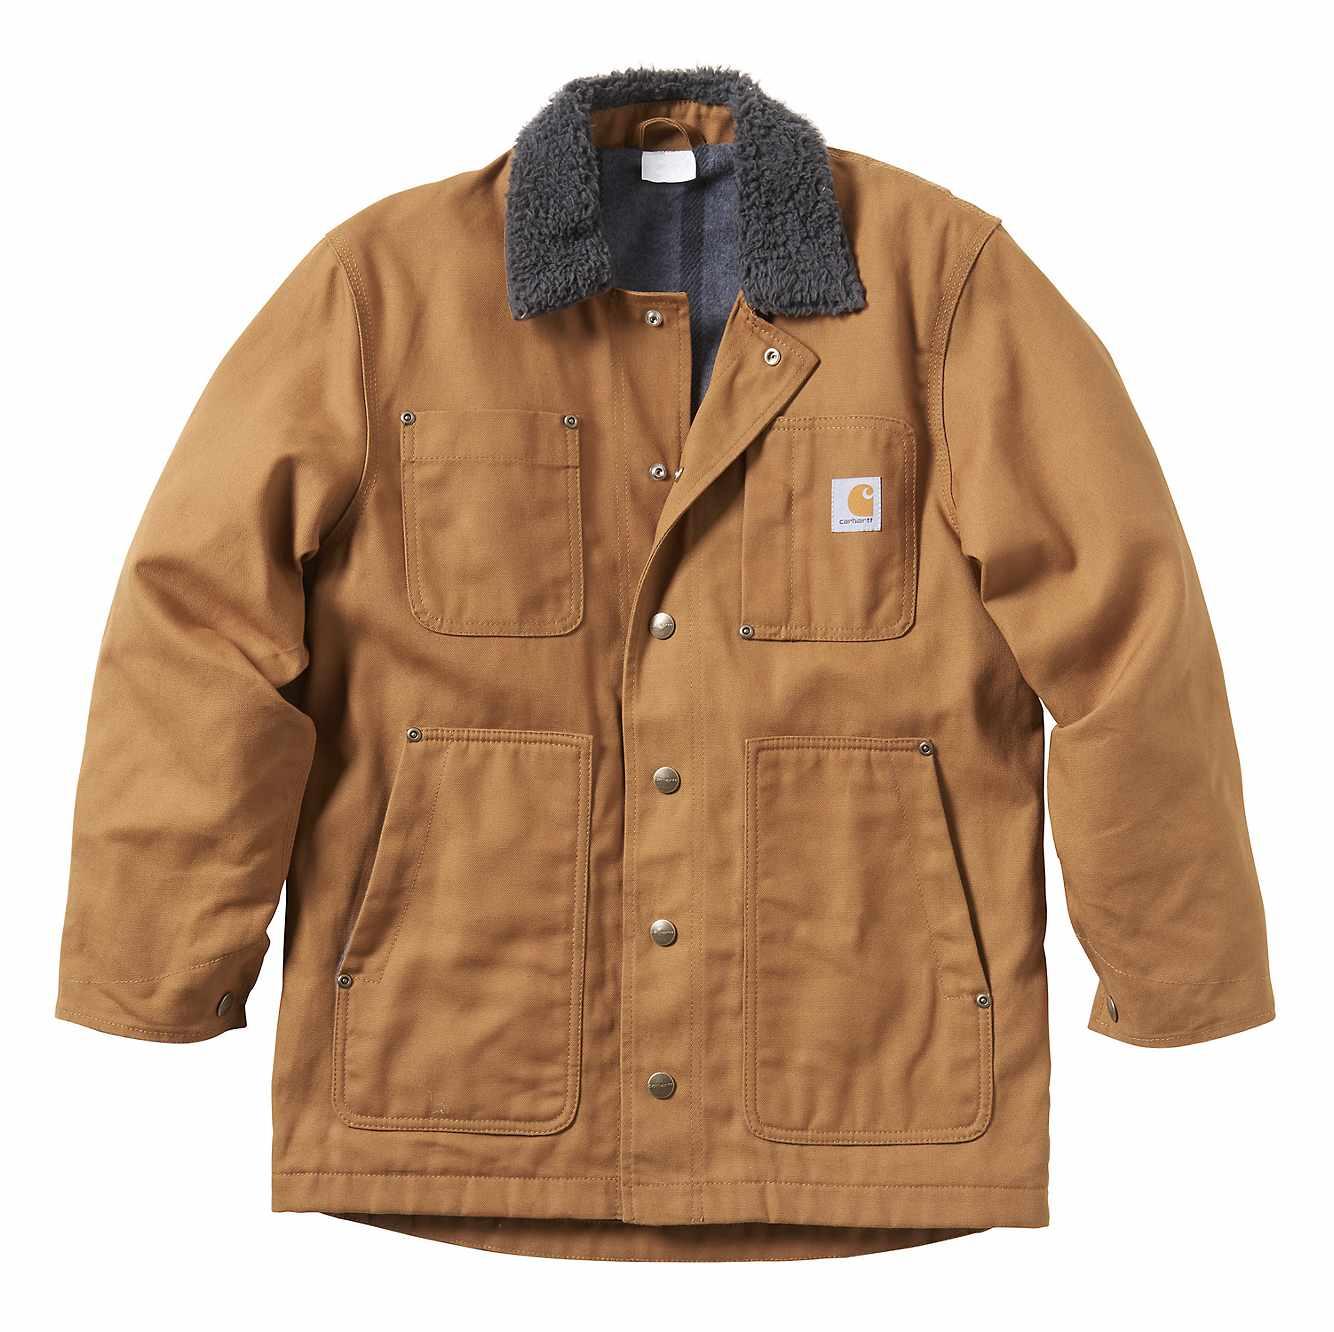 Picture of Full Swing&.0reg; Fleece-Lined Chore Coat in Carhartt Brown